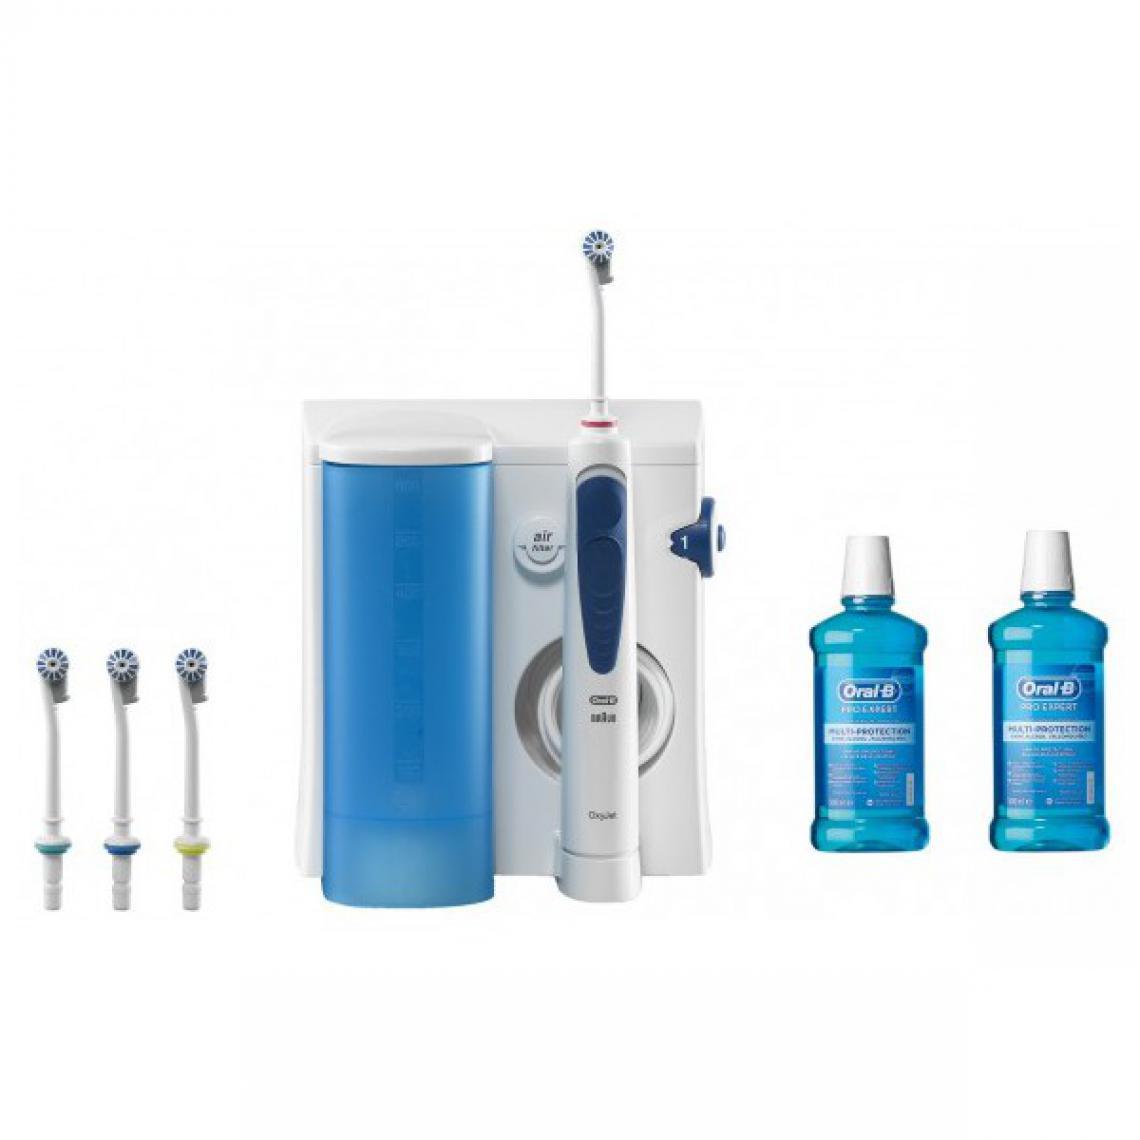 Pack Hydropulseur Oral-B Oxyjet MD20 + 2 bains de bouche Oral B Pro Expert (50cl)